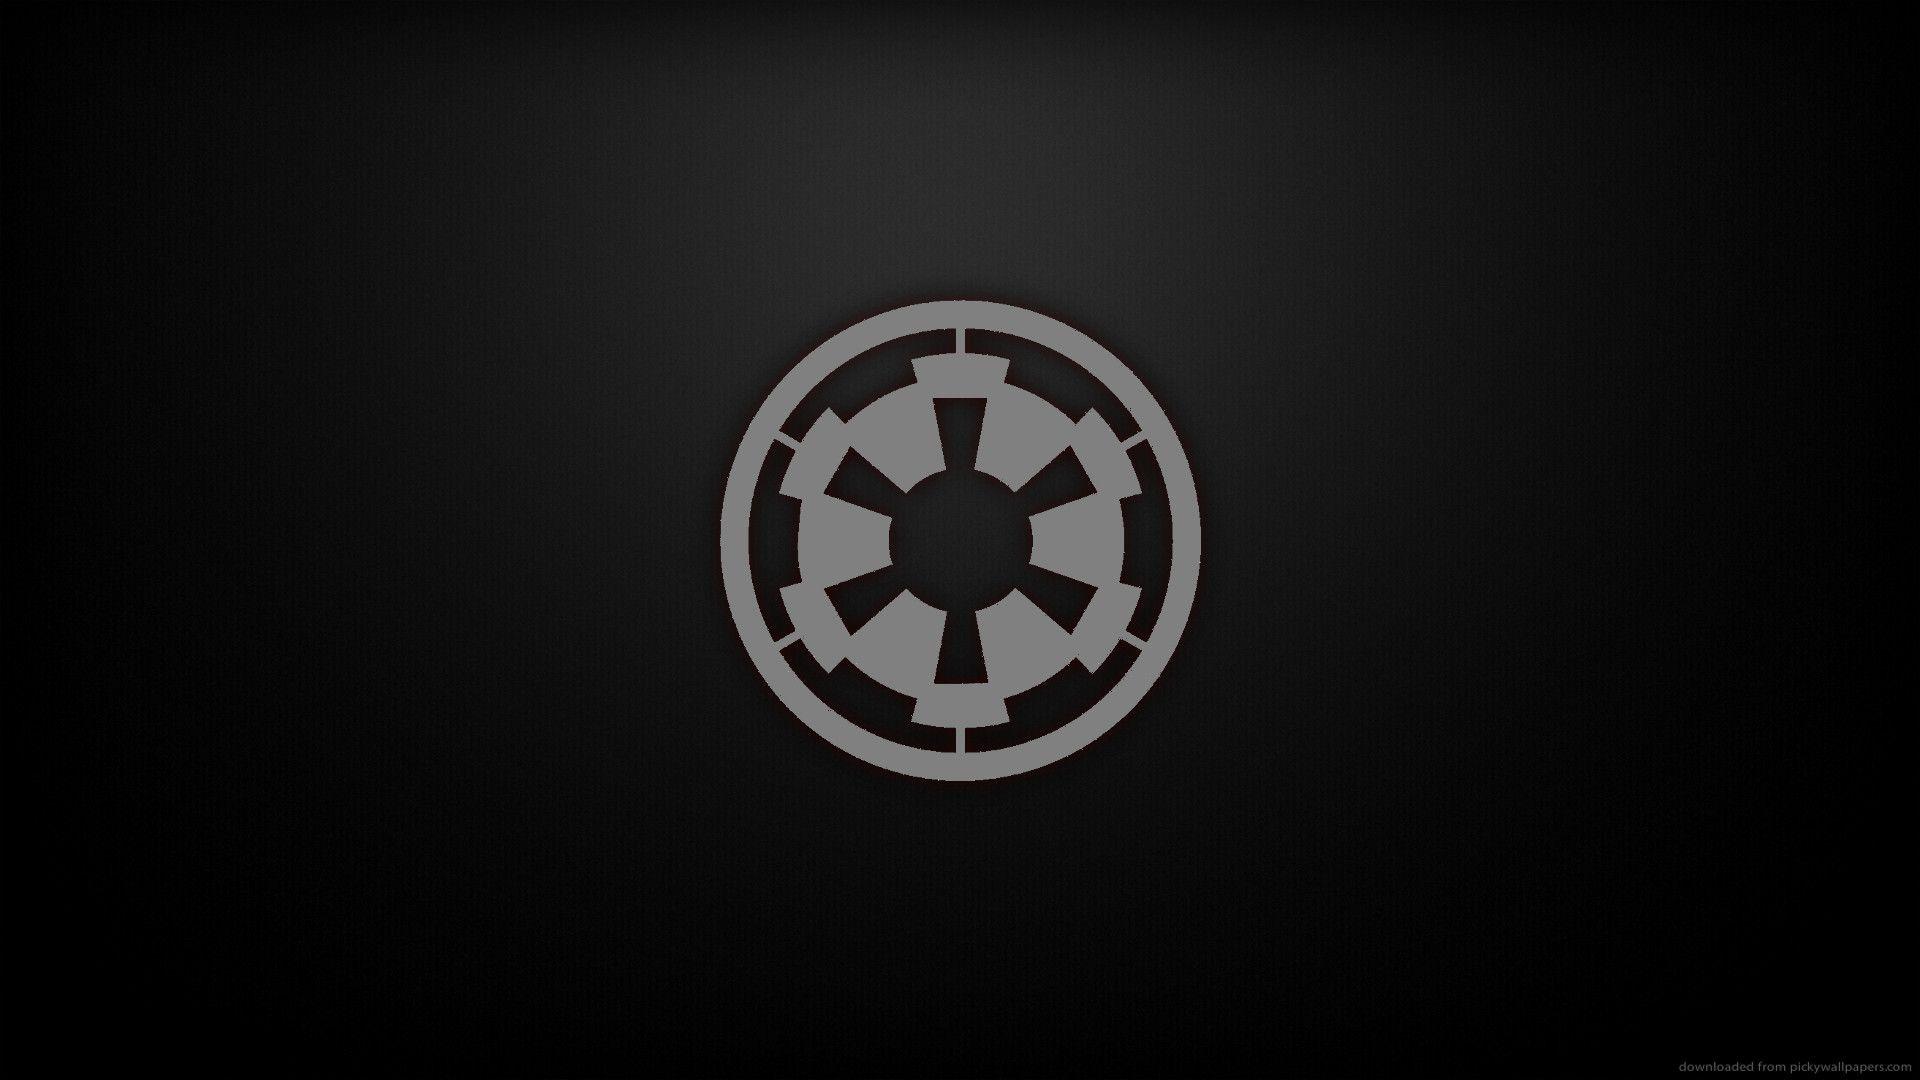 Star Wars Empire Wallpapers On Wallpaperdog